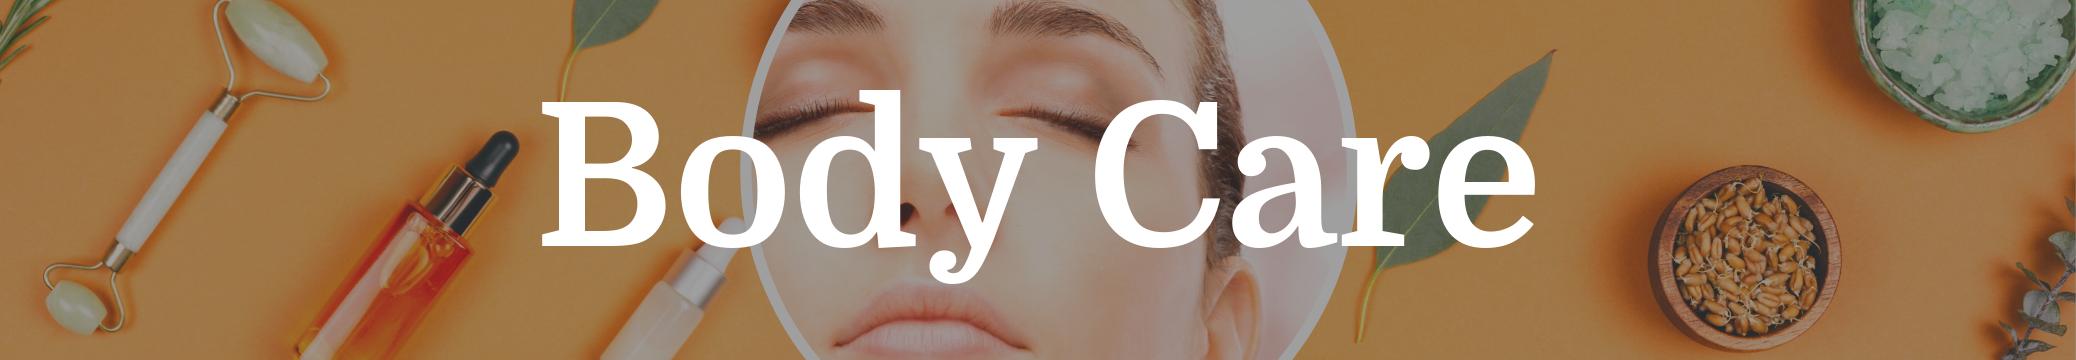 body care header